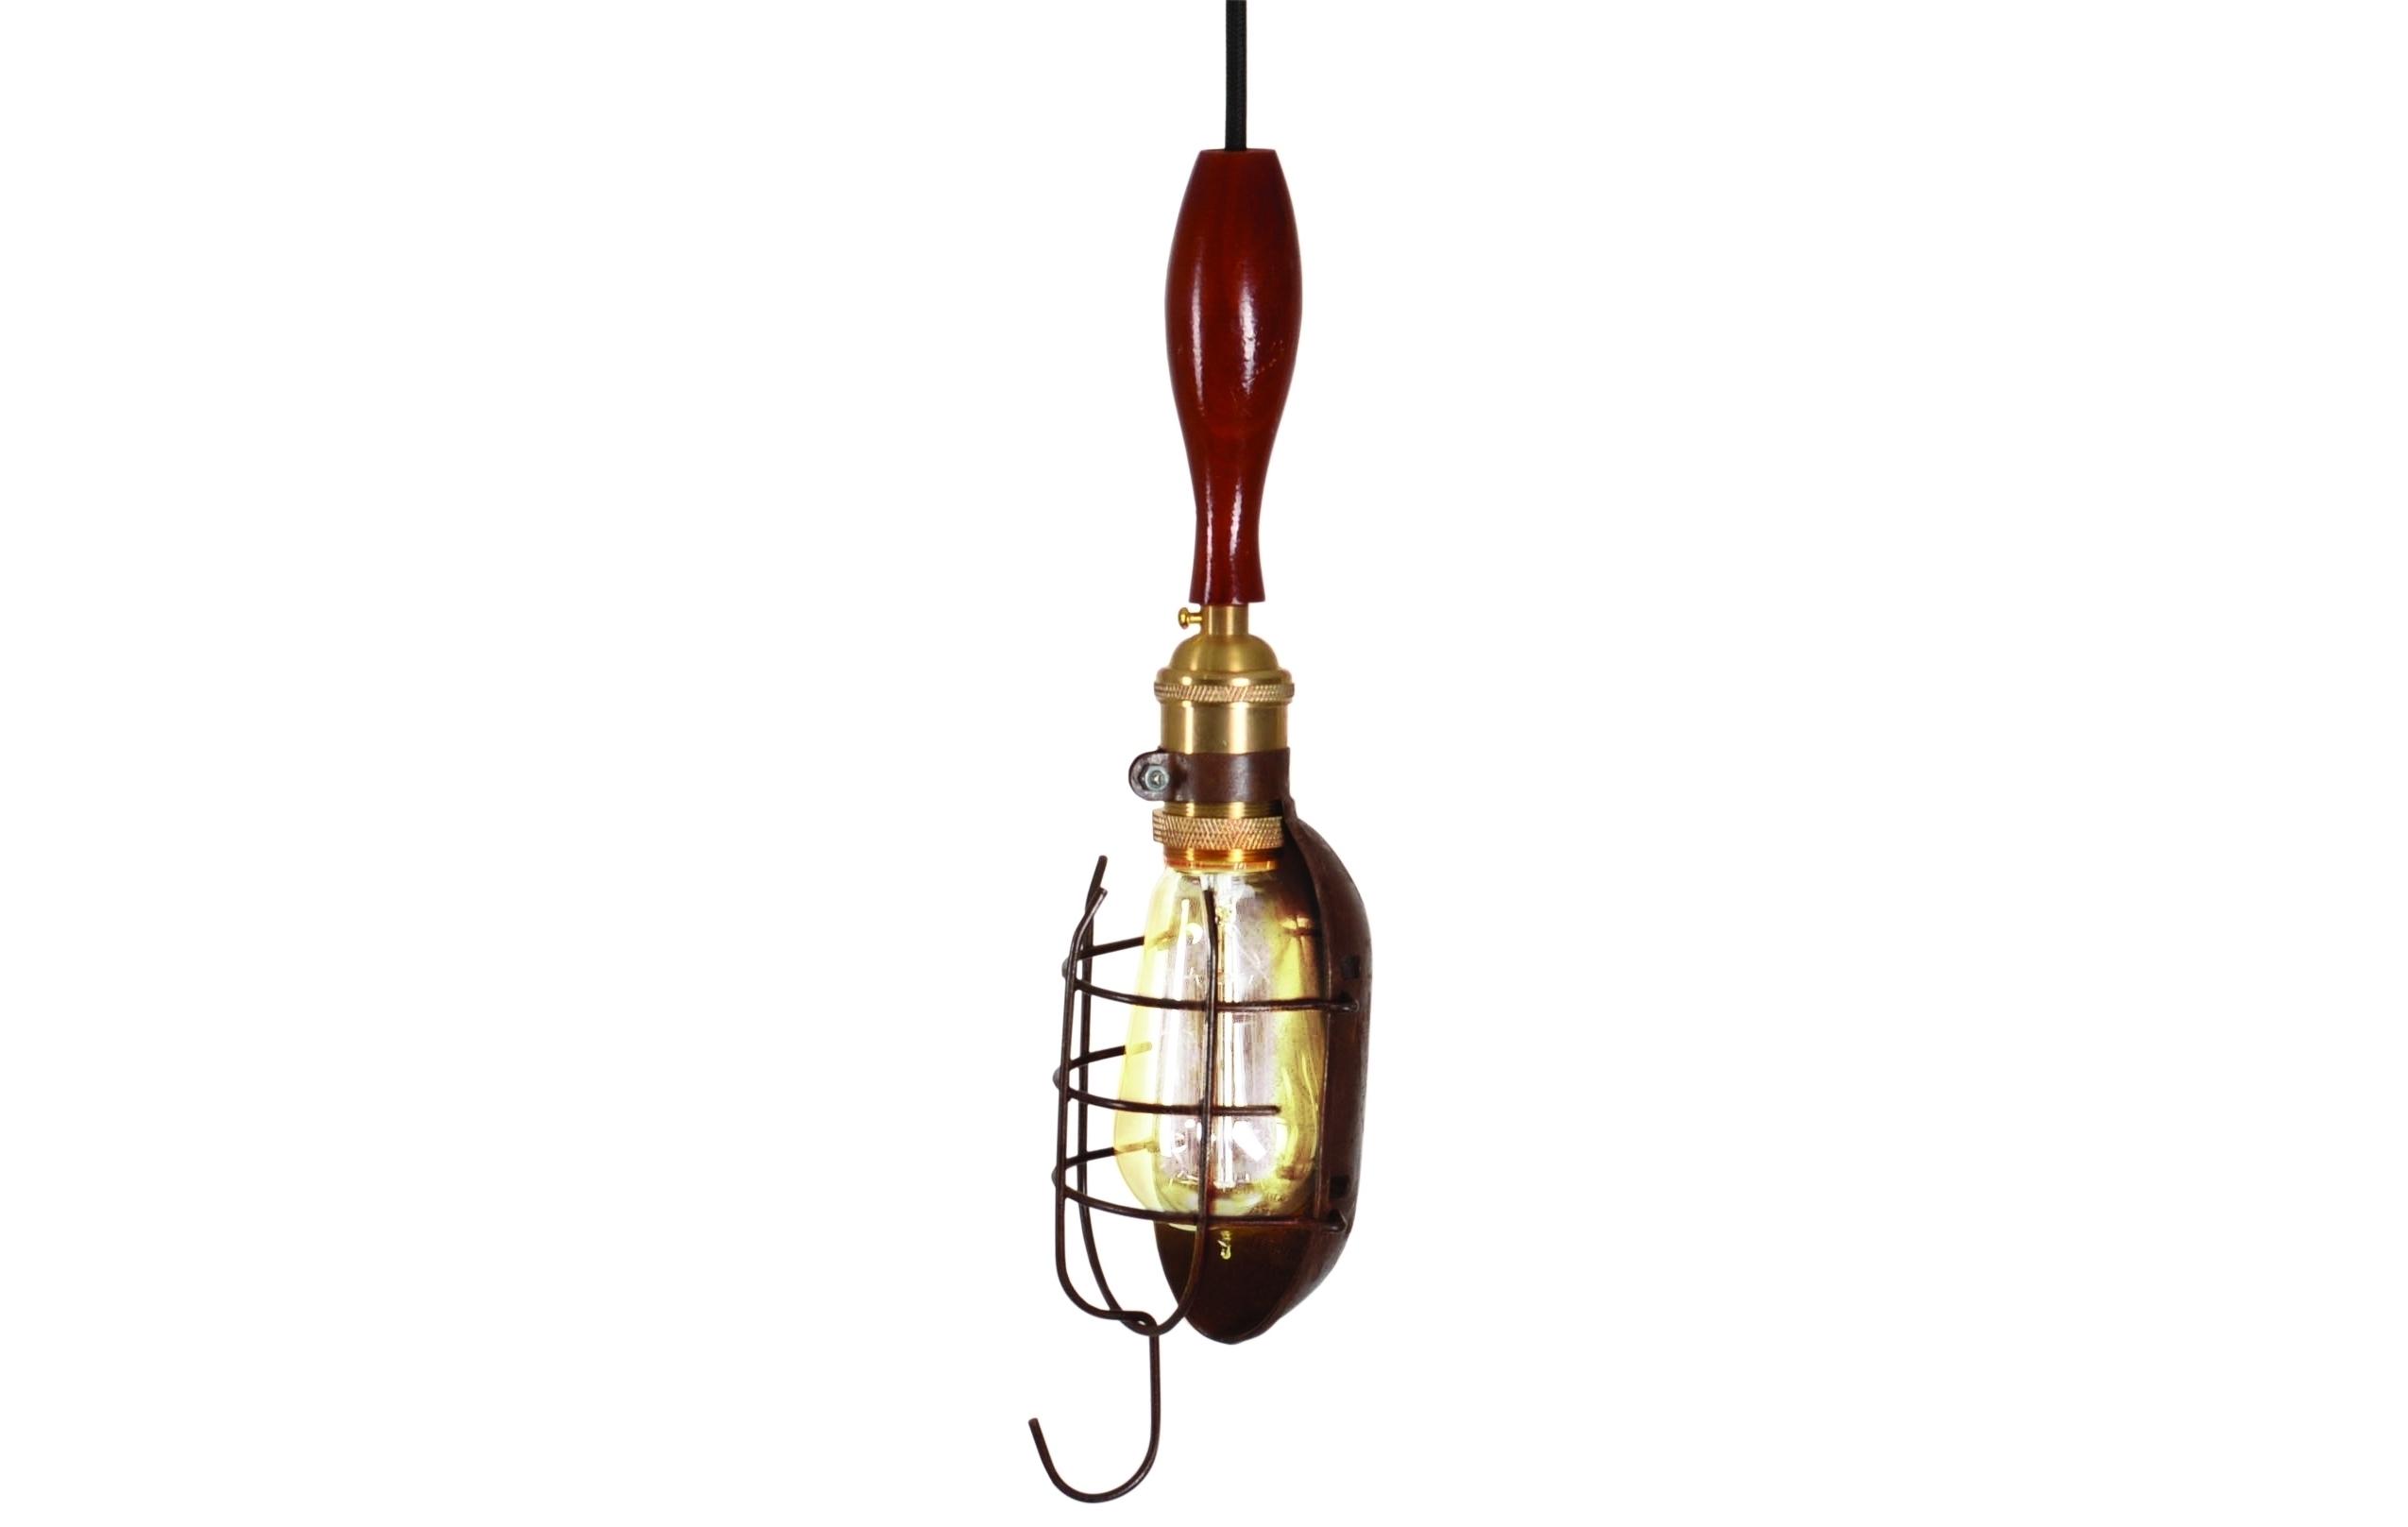 Лампа потолочная Barne?iСветильники на штанге<br>&amp;lt;div&amp;gt;Цоколь: E27&amp;lt;/div&amp;gt;&amp;lt;div&amp;gt;Мощность лампы: 100W&amp;lt;/div&amp;gt;&amp;lt;div&amp;gt;Количество: 1 (в комплект не входят)&amp;lt;/div&amp;gt;<br><br>Material: Металл<br>Width см: 7<br>Depth см: 9<br>Height см: 34